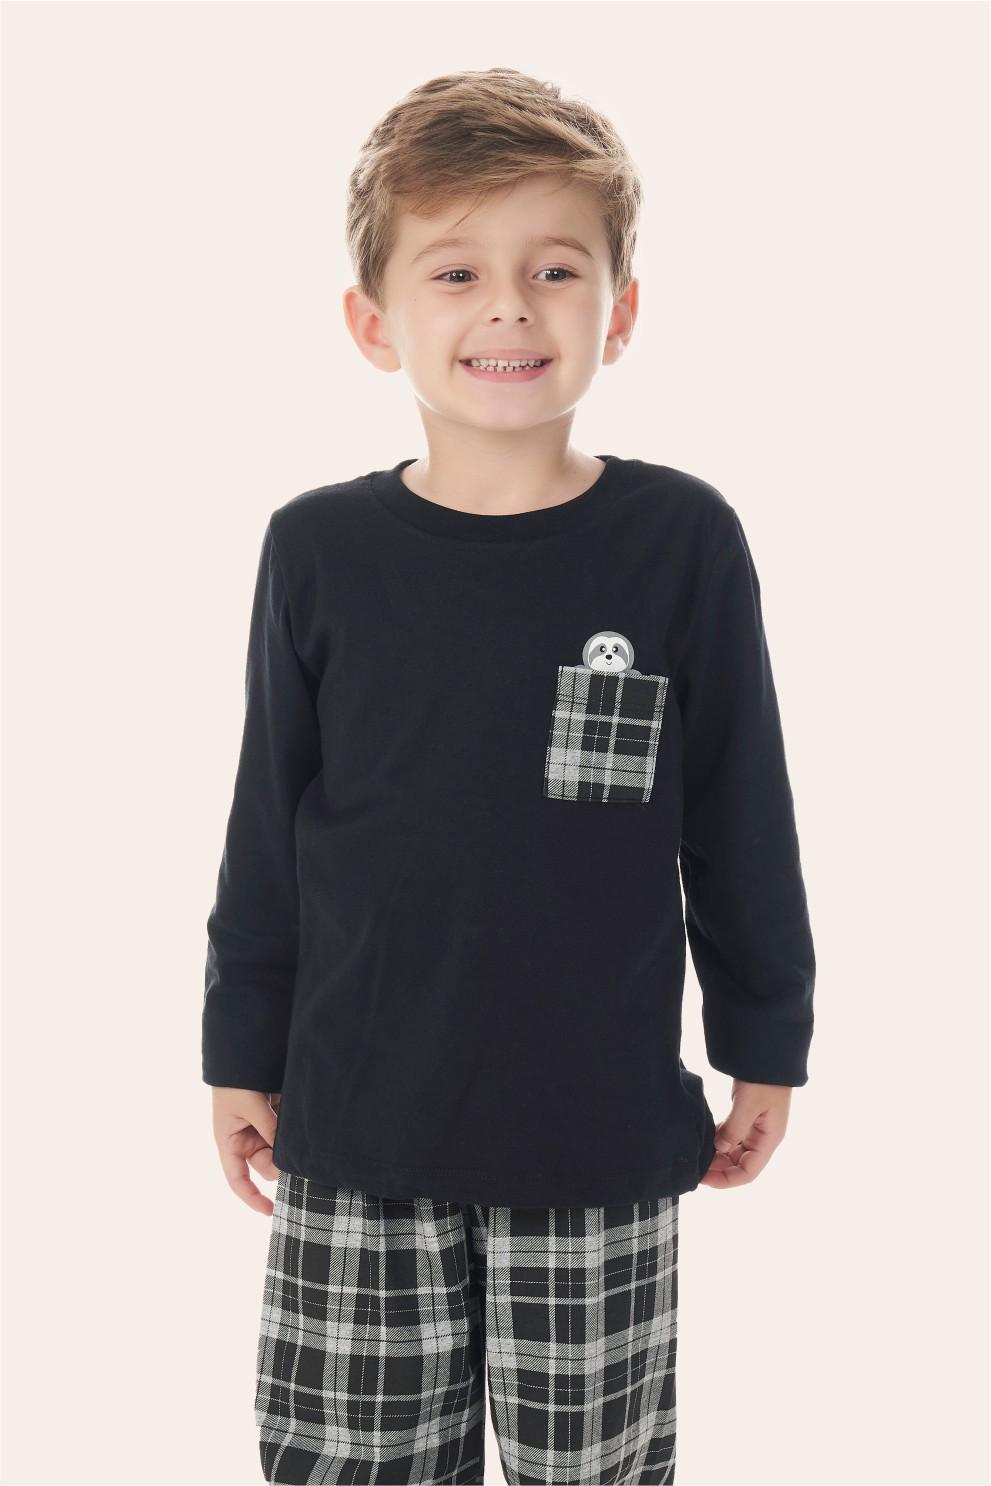 002/F - Pijama Infantil Masculino Xadrez Preto